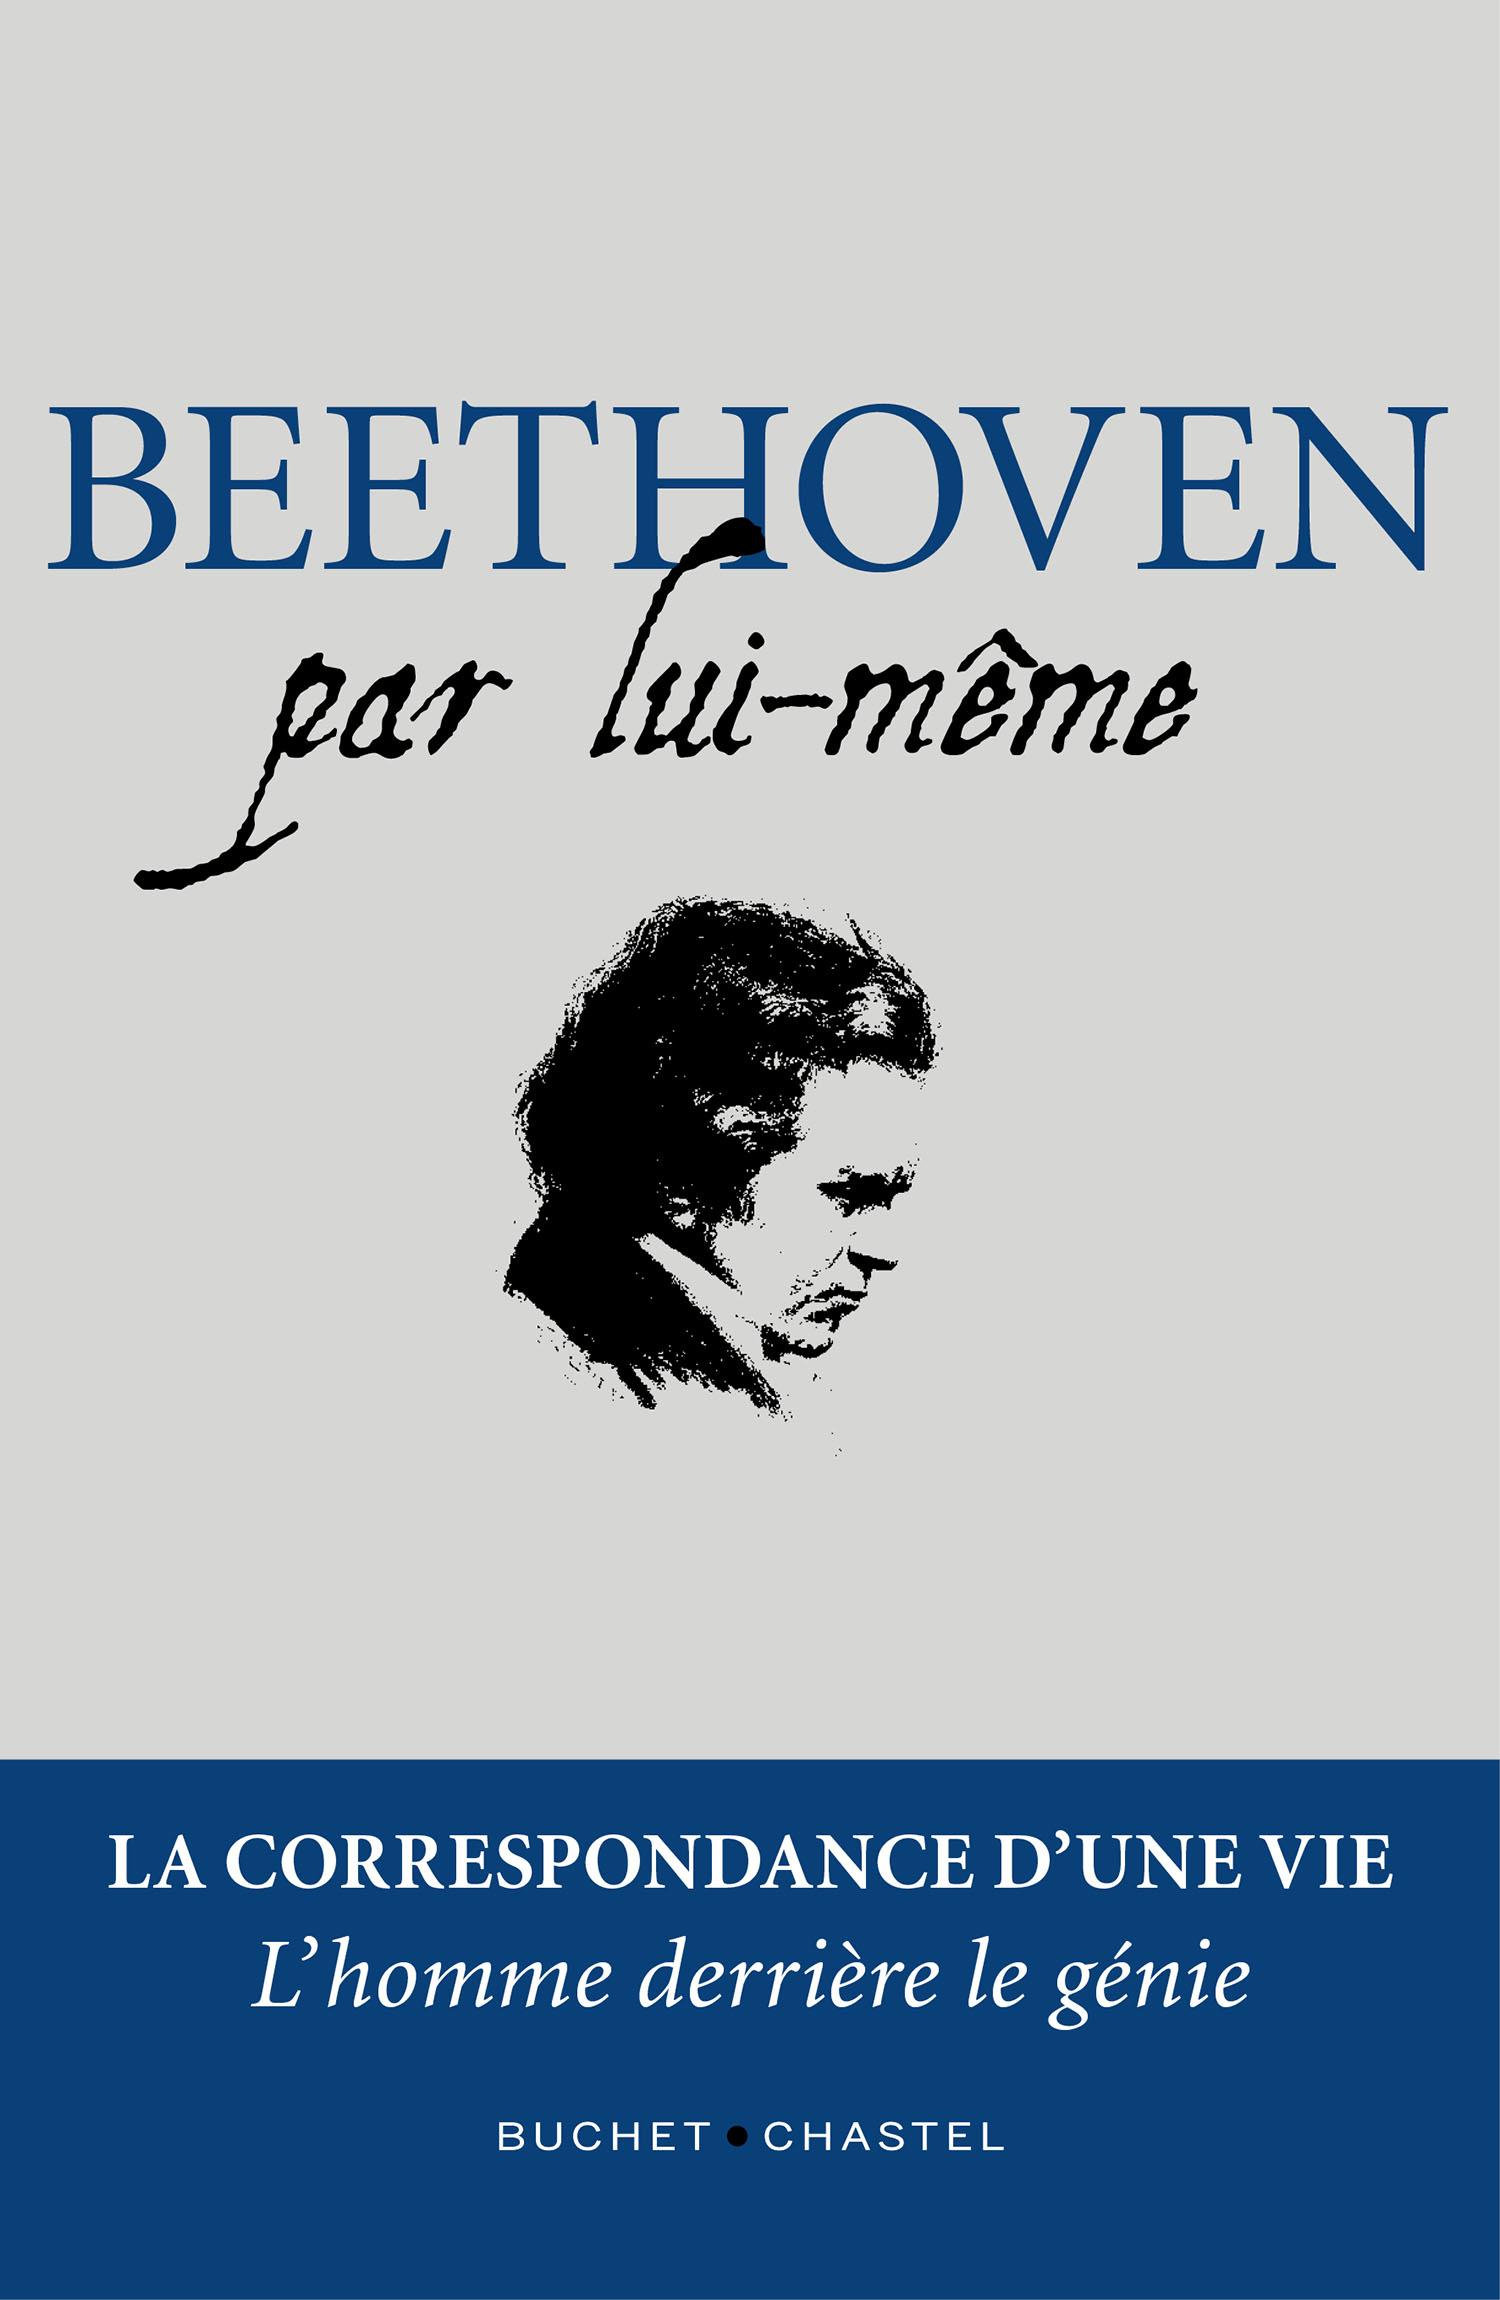 Vignette du livre Beethoven par lui-même - Ludwig van Beethoven